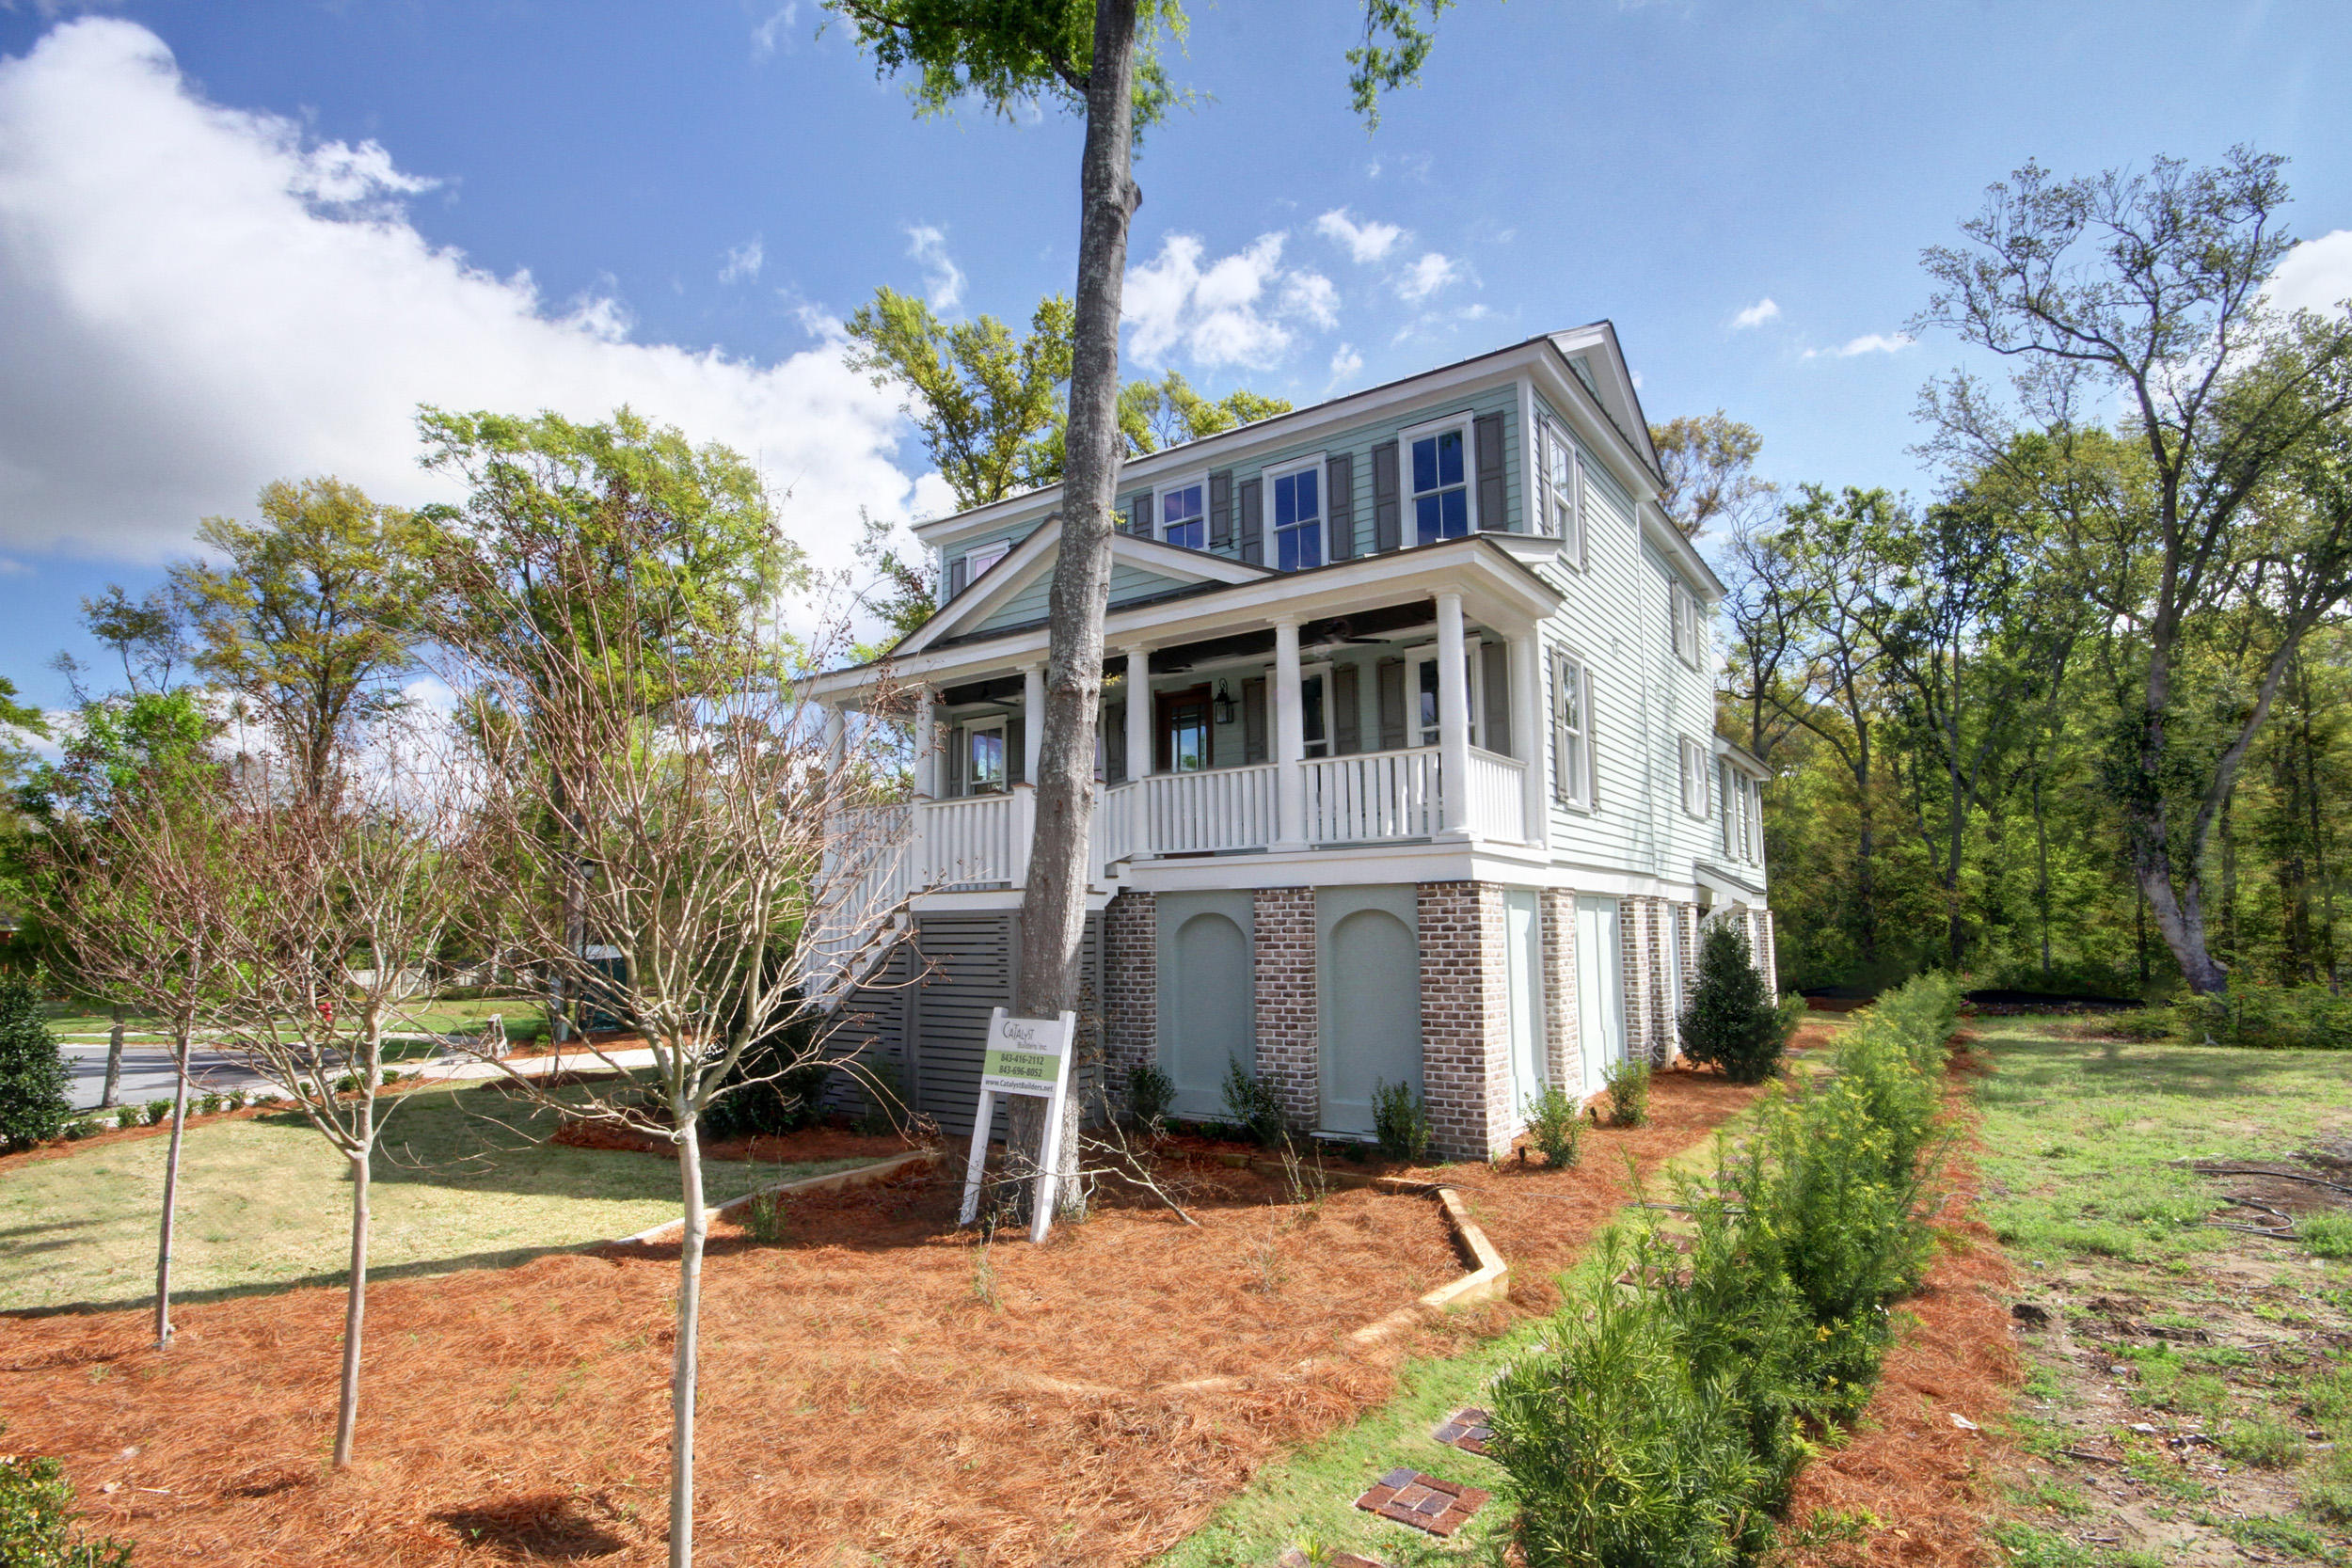 Mathis Ferry Court Homes For Sale - 1212 Clonmel Place, Mount Pleasant, SC - 7